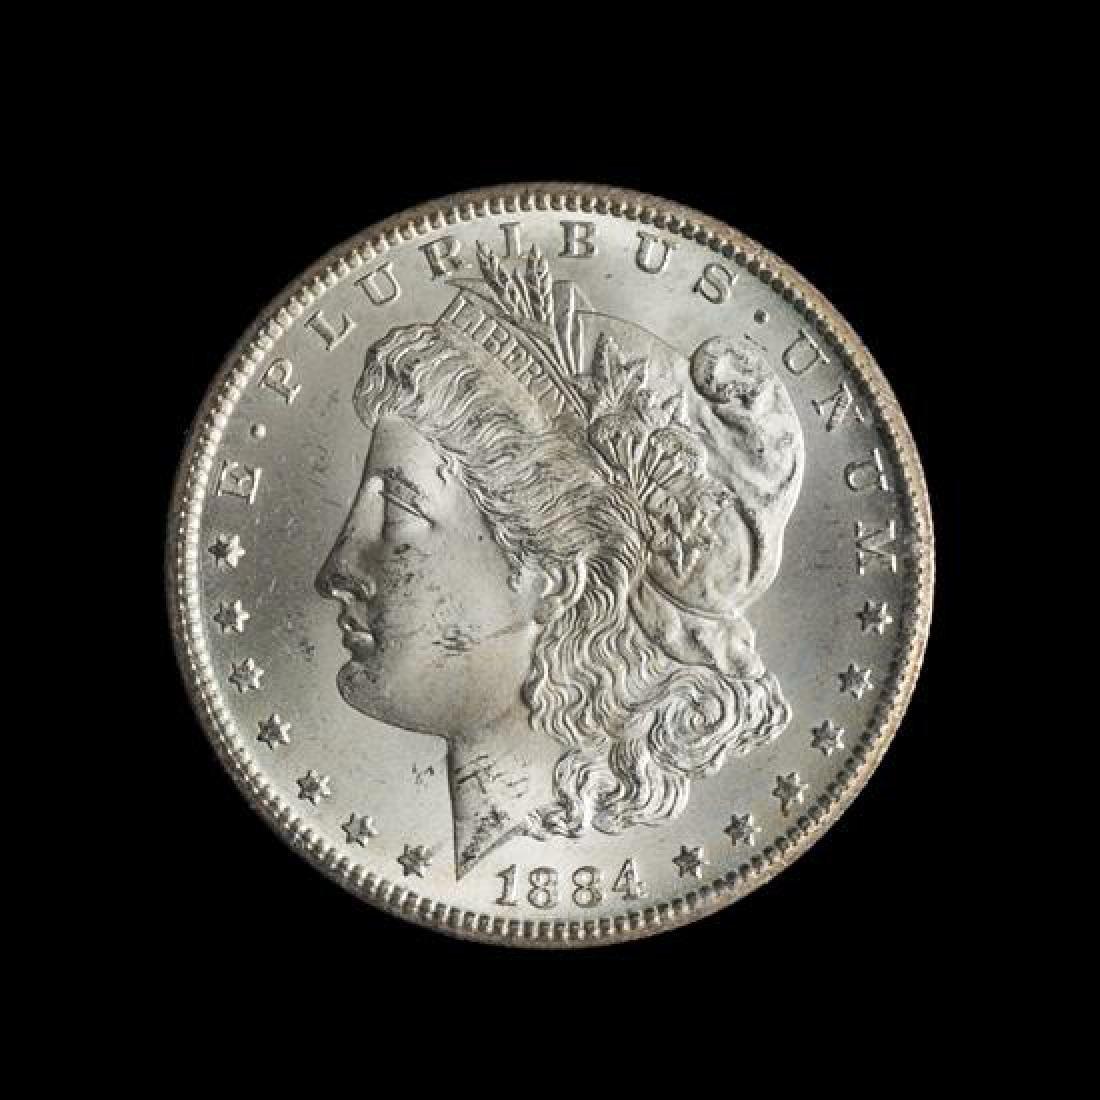 A United States 1884-CC GSA: Morgan Silver Dollar Coin